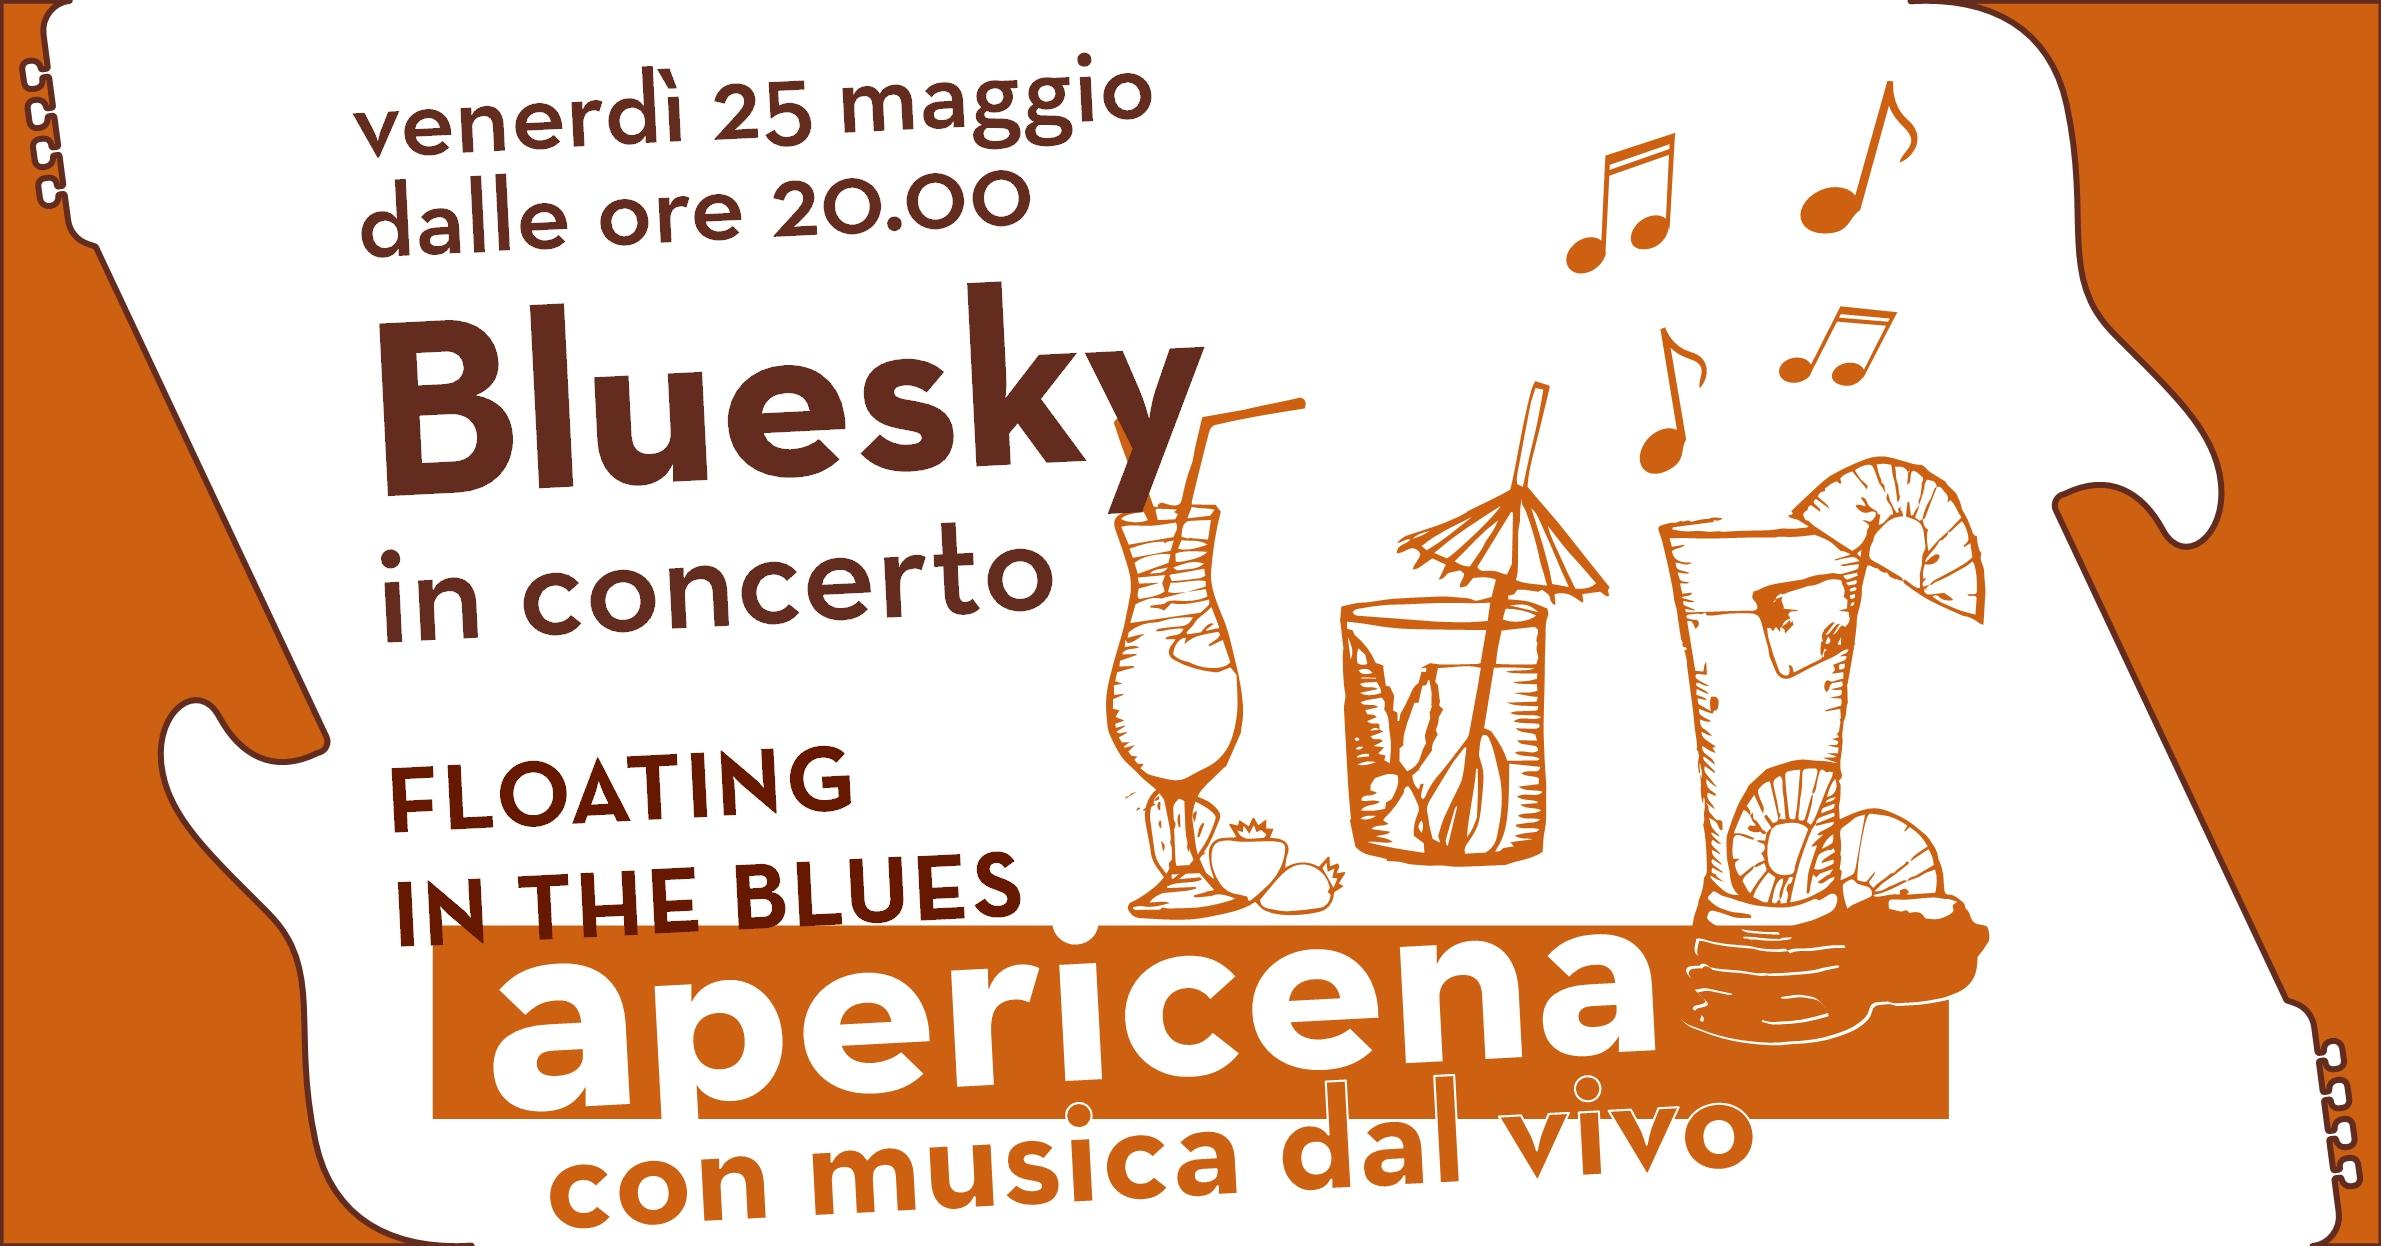 E0134_180525_Concerto_Bluesky_2_XSOC